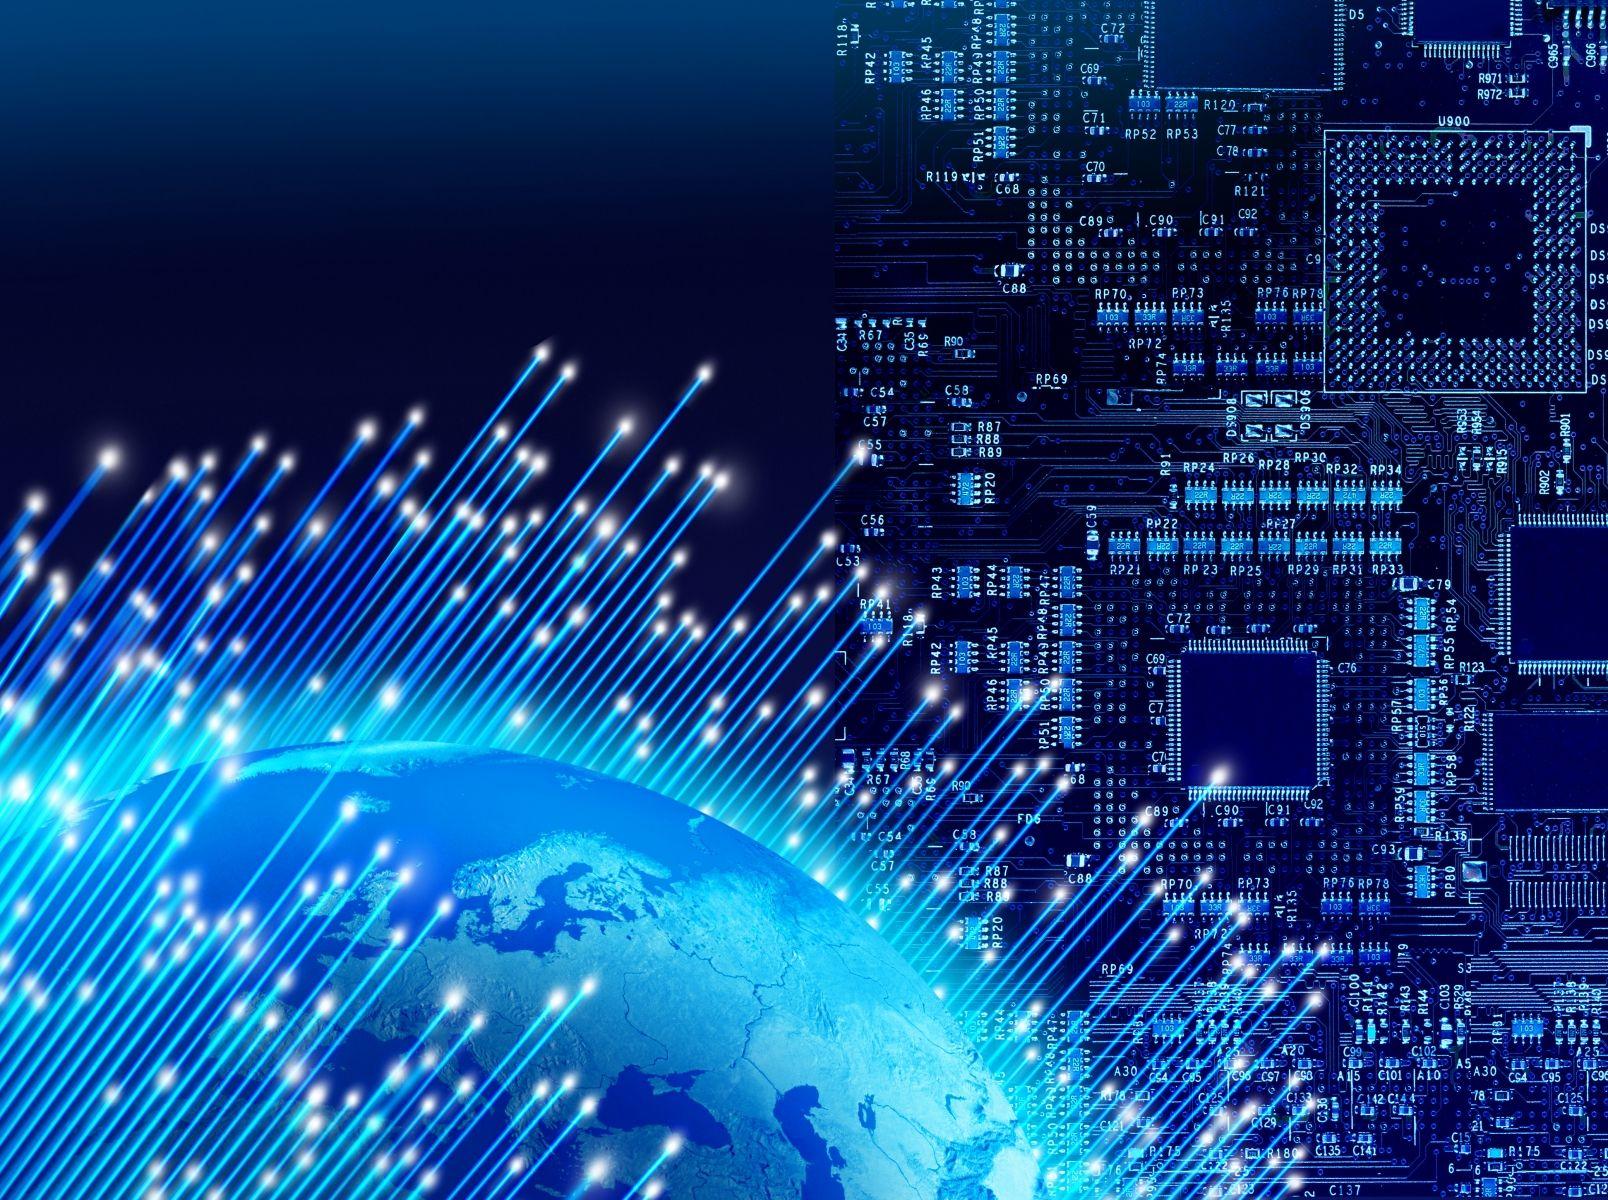 Global Networking Hub dedicated to Entrepreneurs, Startups